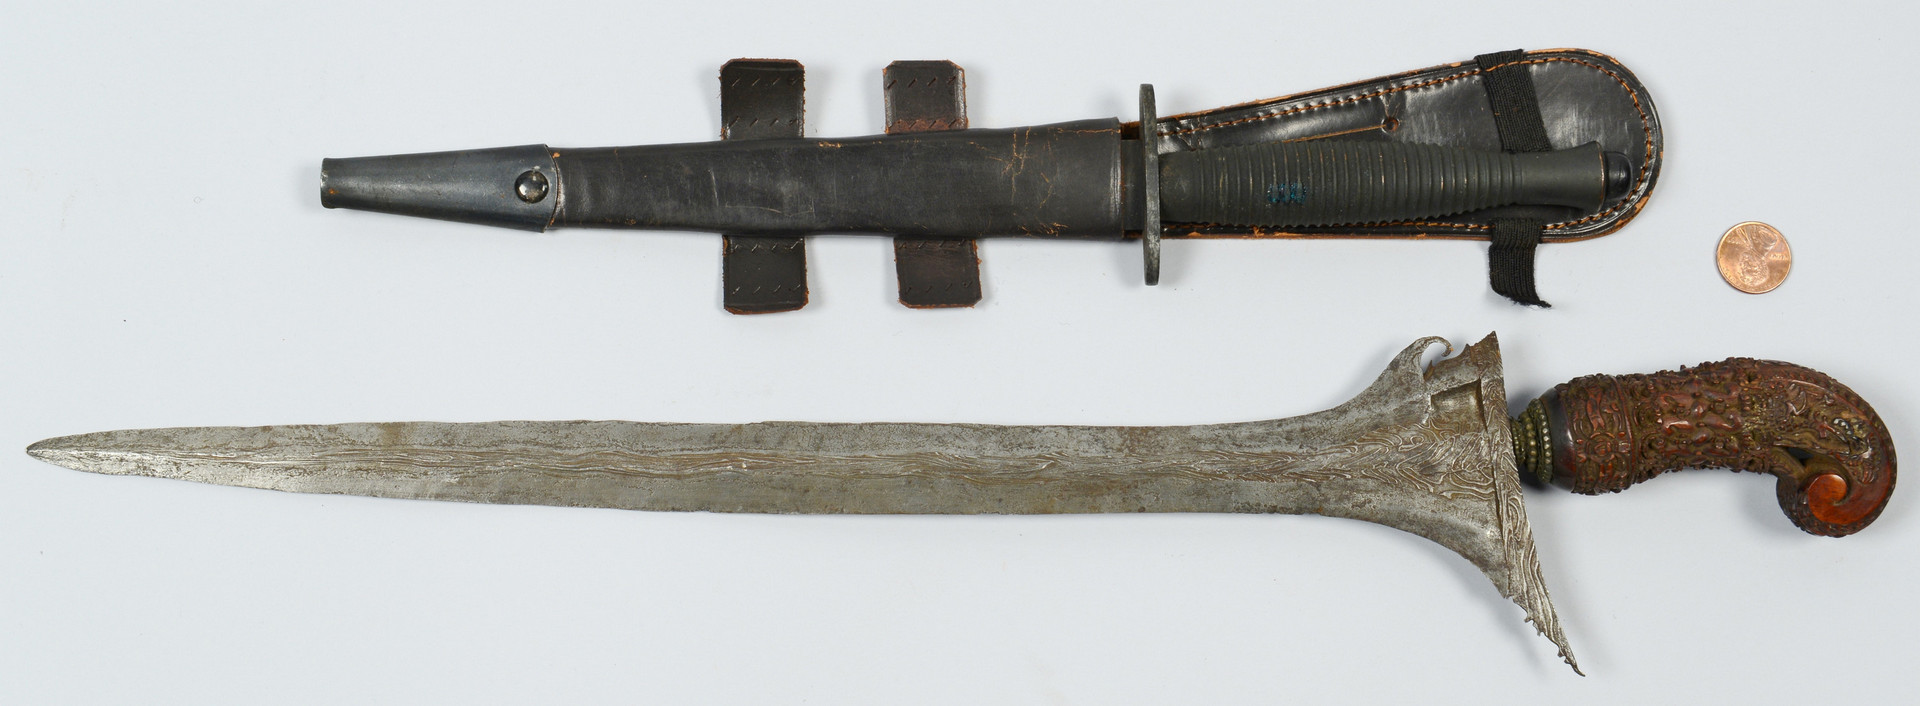 Lot 408: Kris Dagger, Commando Knife